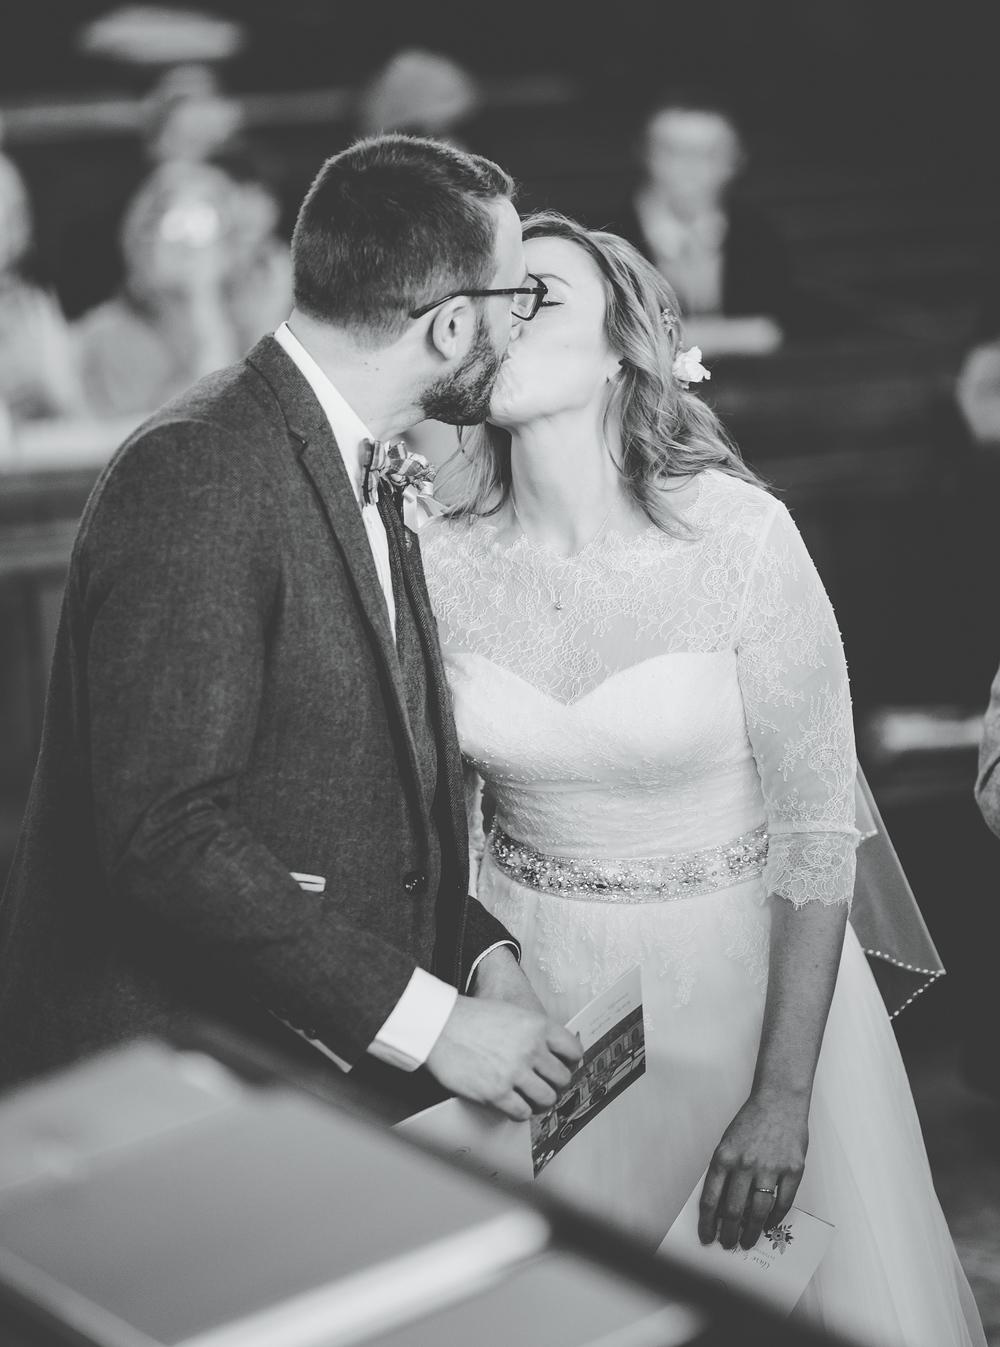 Cheshire wedding photographer - Marthall Hall Wedding (19).jpg